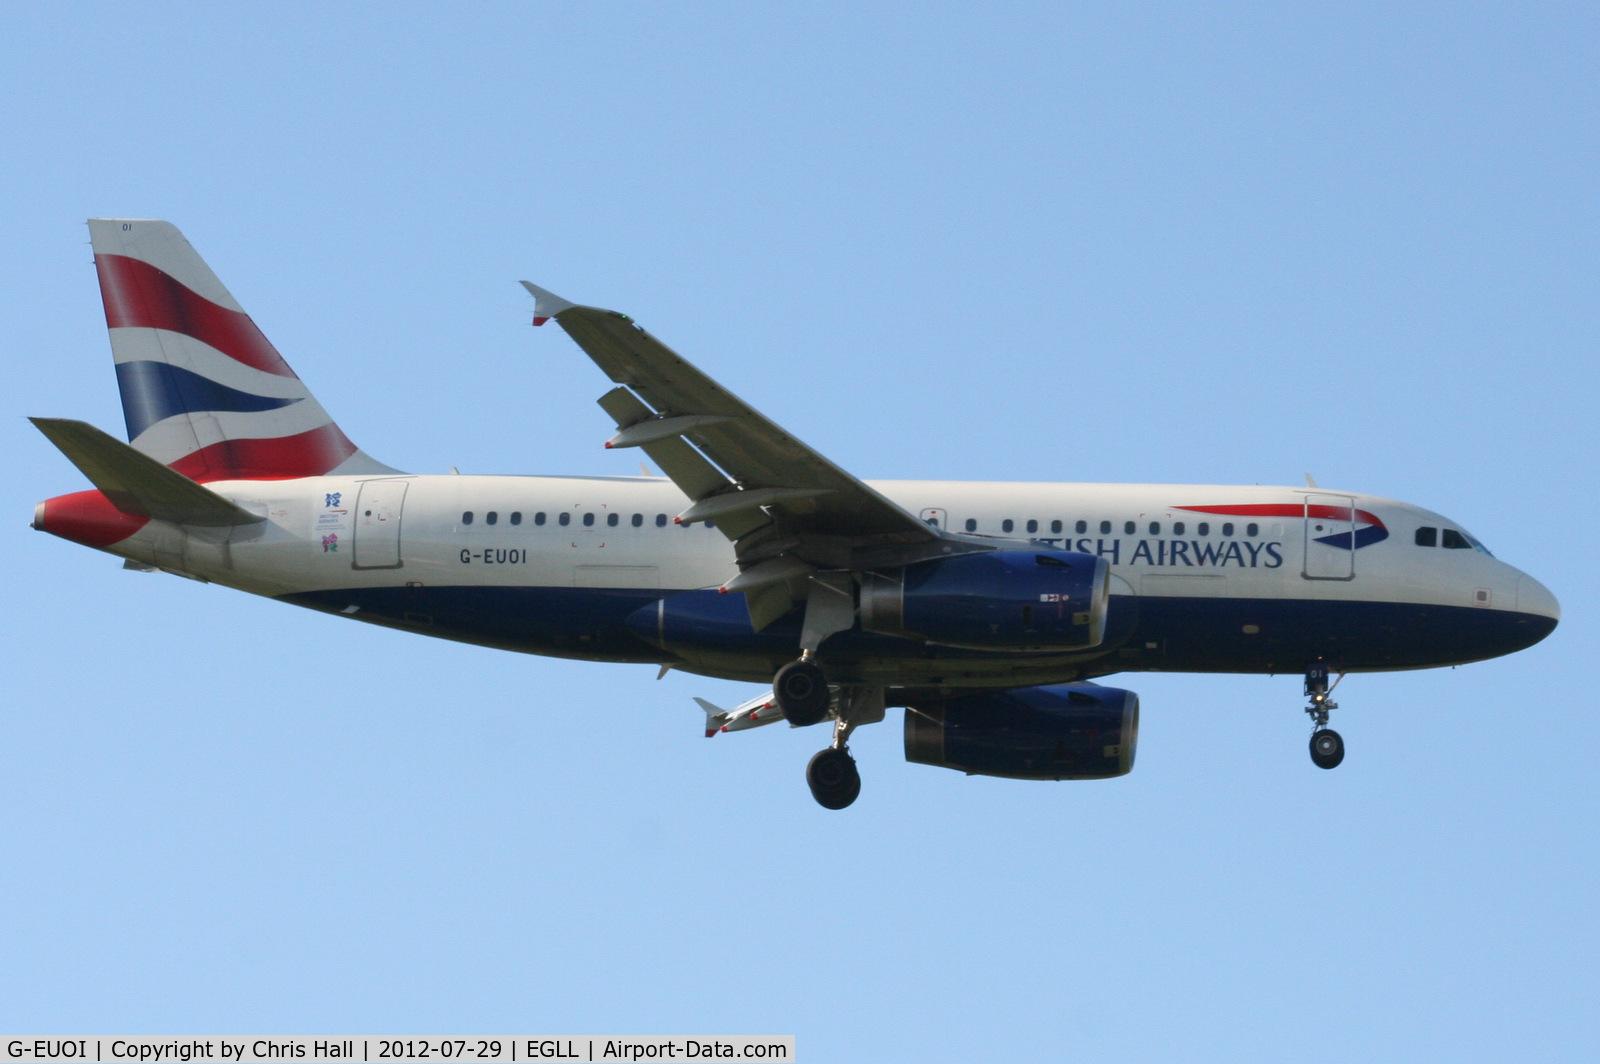 G-EUOI, 2001 Airbus A319-131 C/N 1606, British Airways